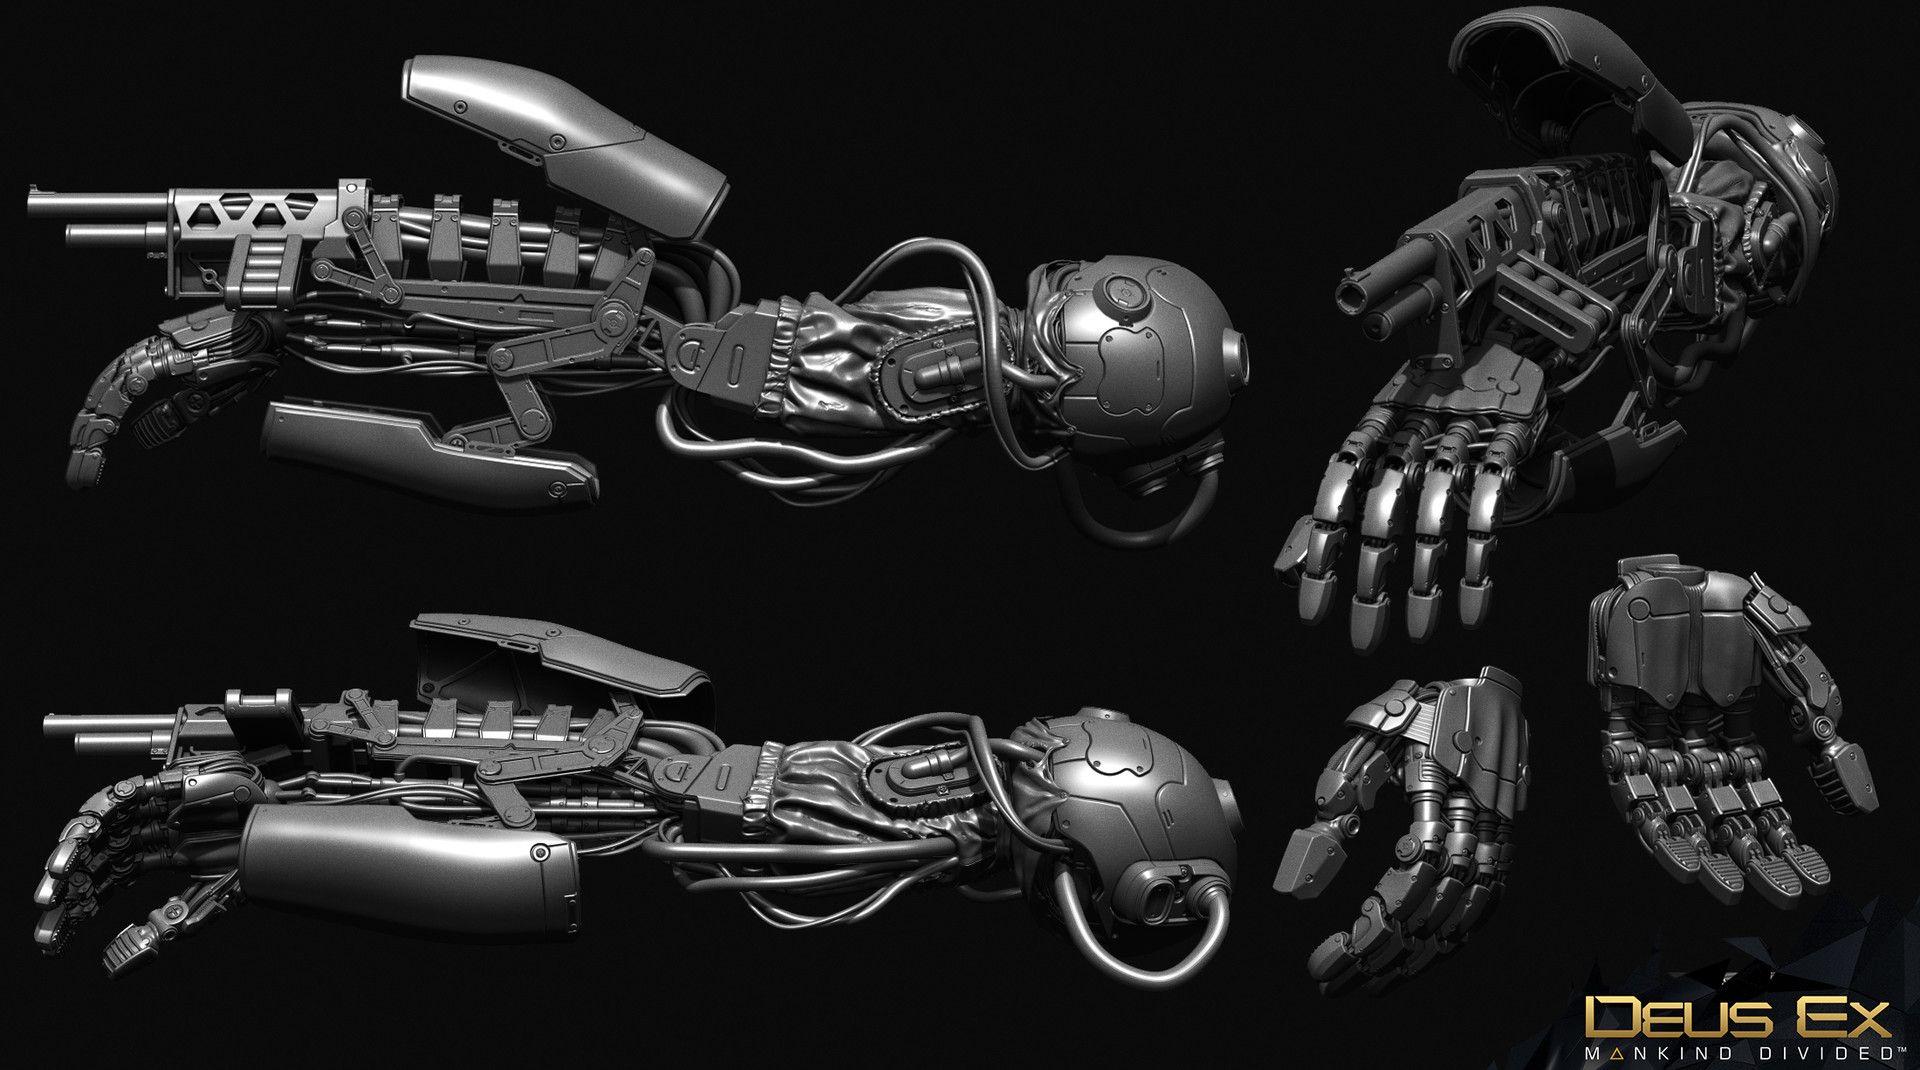 Softness, warmth, and responsiveness improve robot hugs